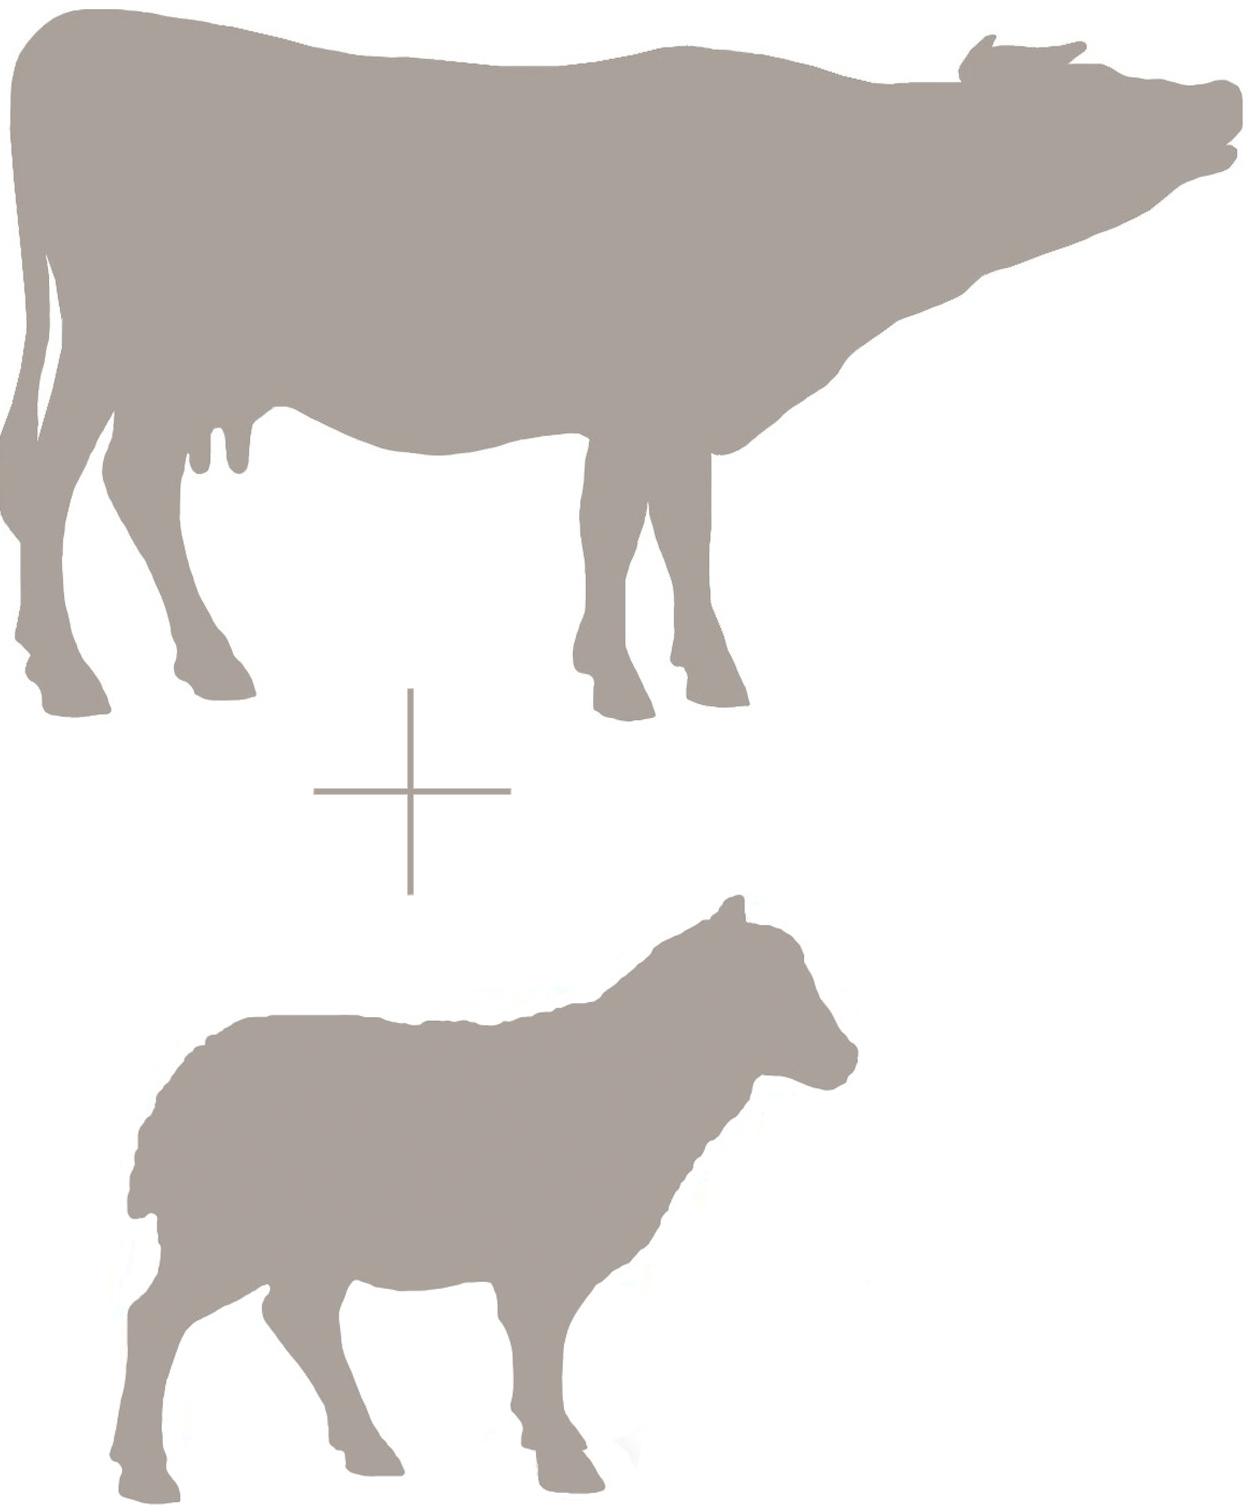 Cow and Sheep Emblem.jpg